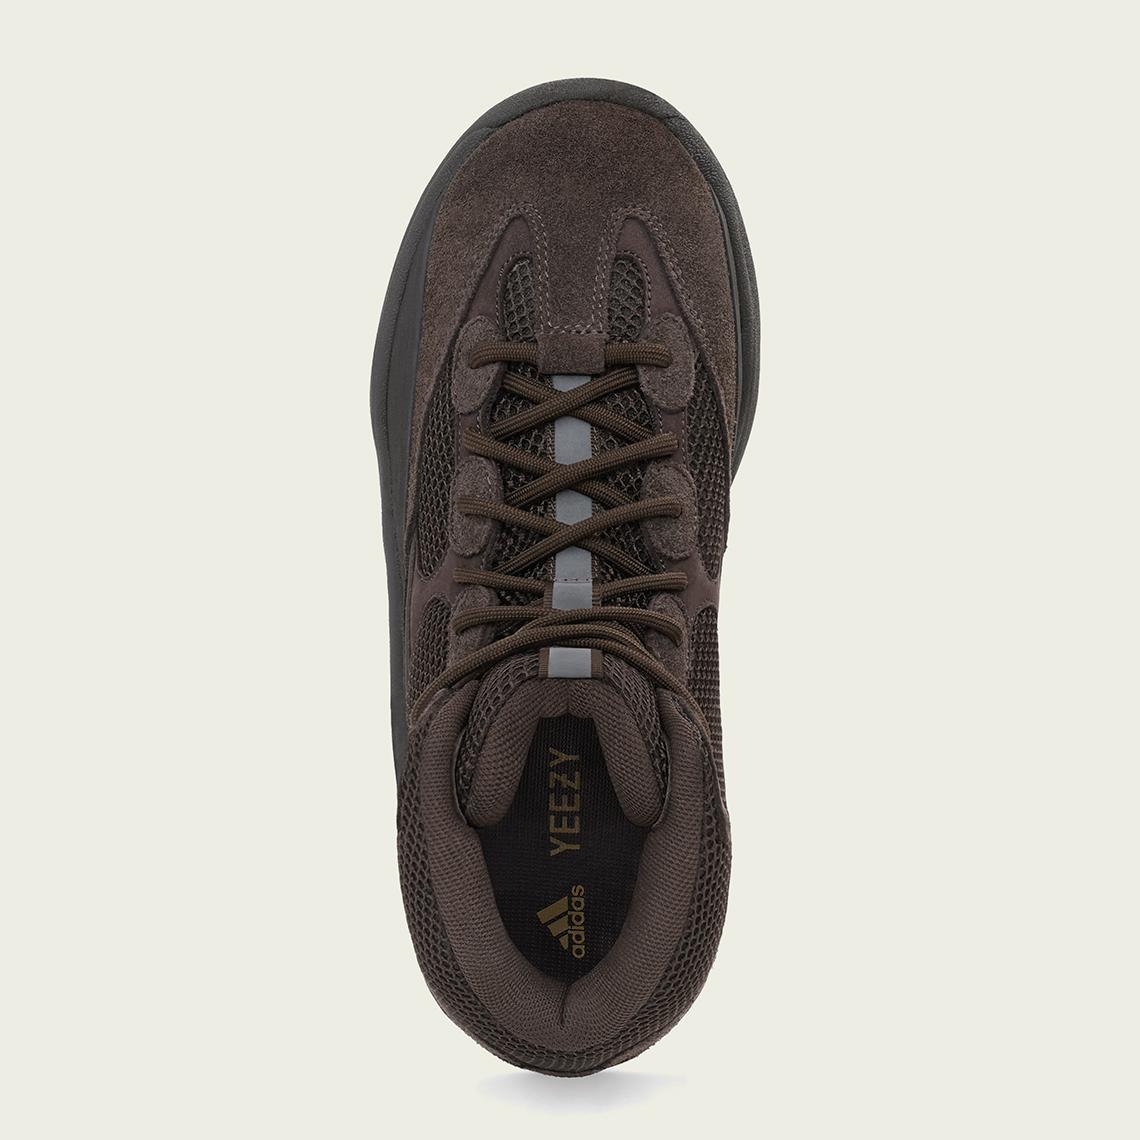 016fdb1ce62 adidas Yeezy Desert Boot Oil Release Date | SneakerNews.com